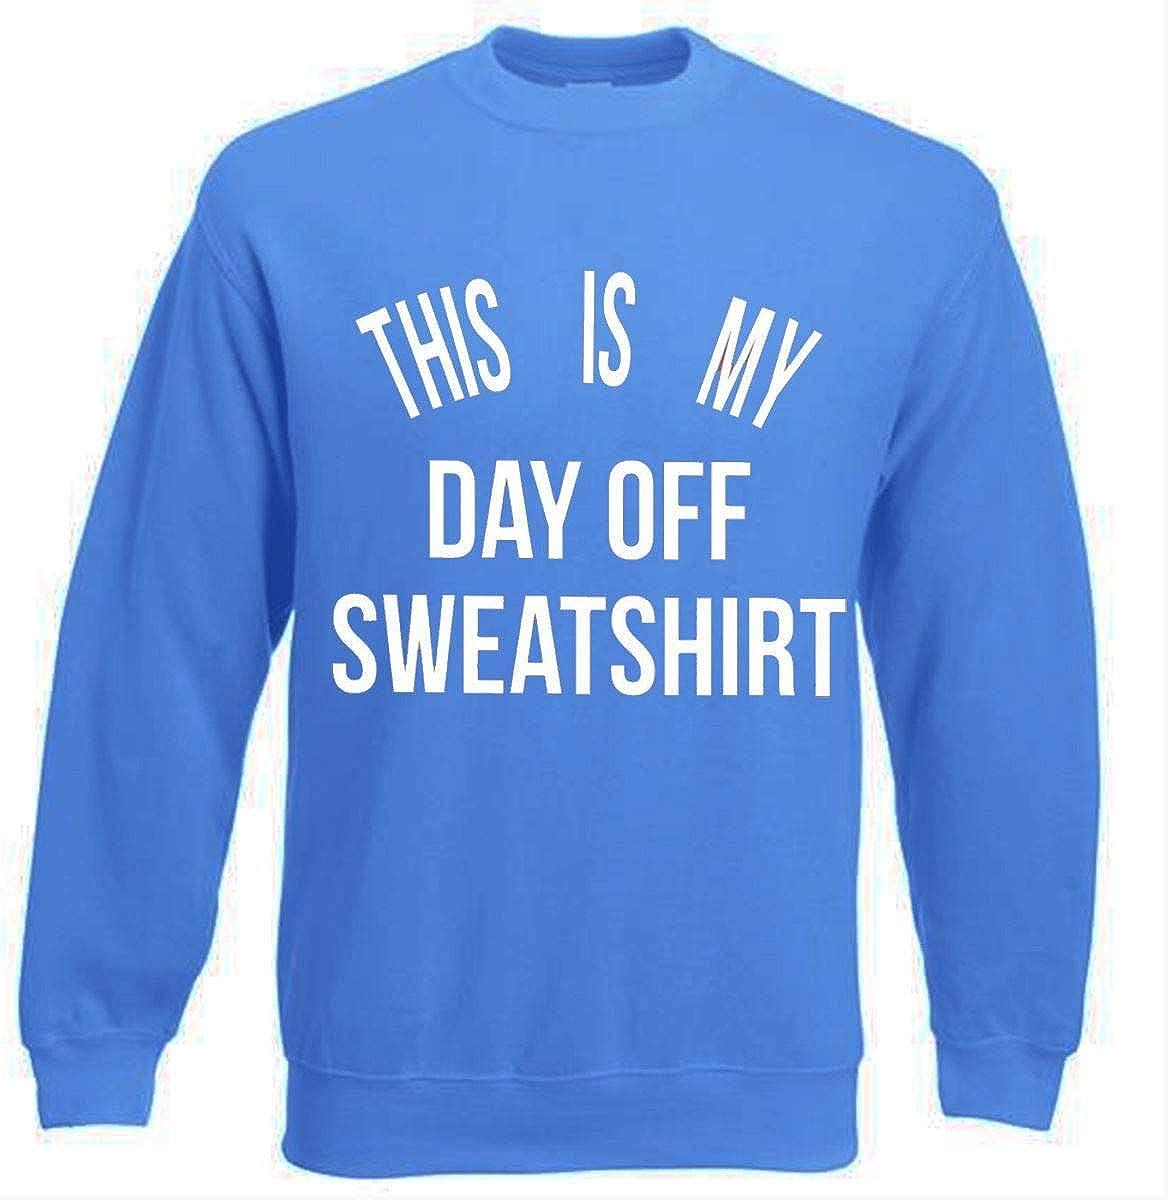 Ladies Casual This Is My Day Off Slogan Sweatshirt Novelty Top Jumper 8-14